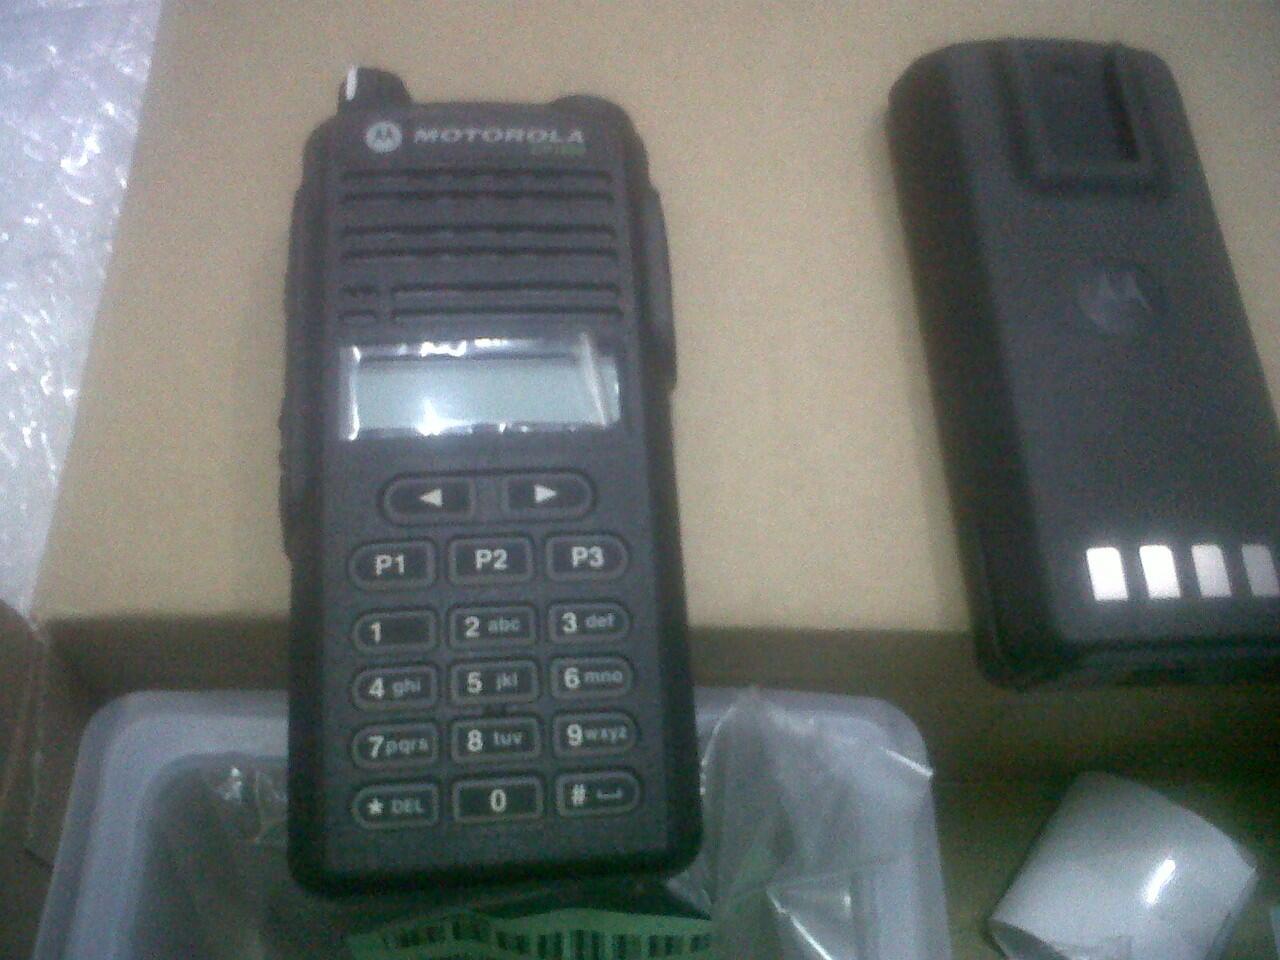 HT Motorola CP 1660 UHF BNIB